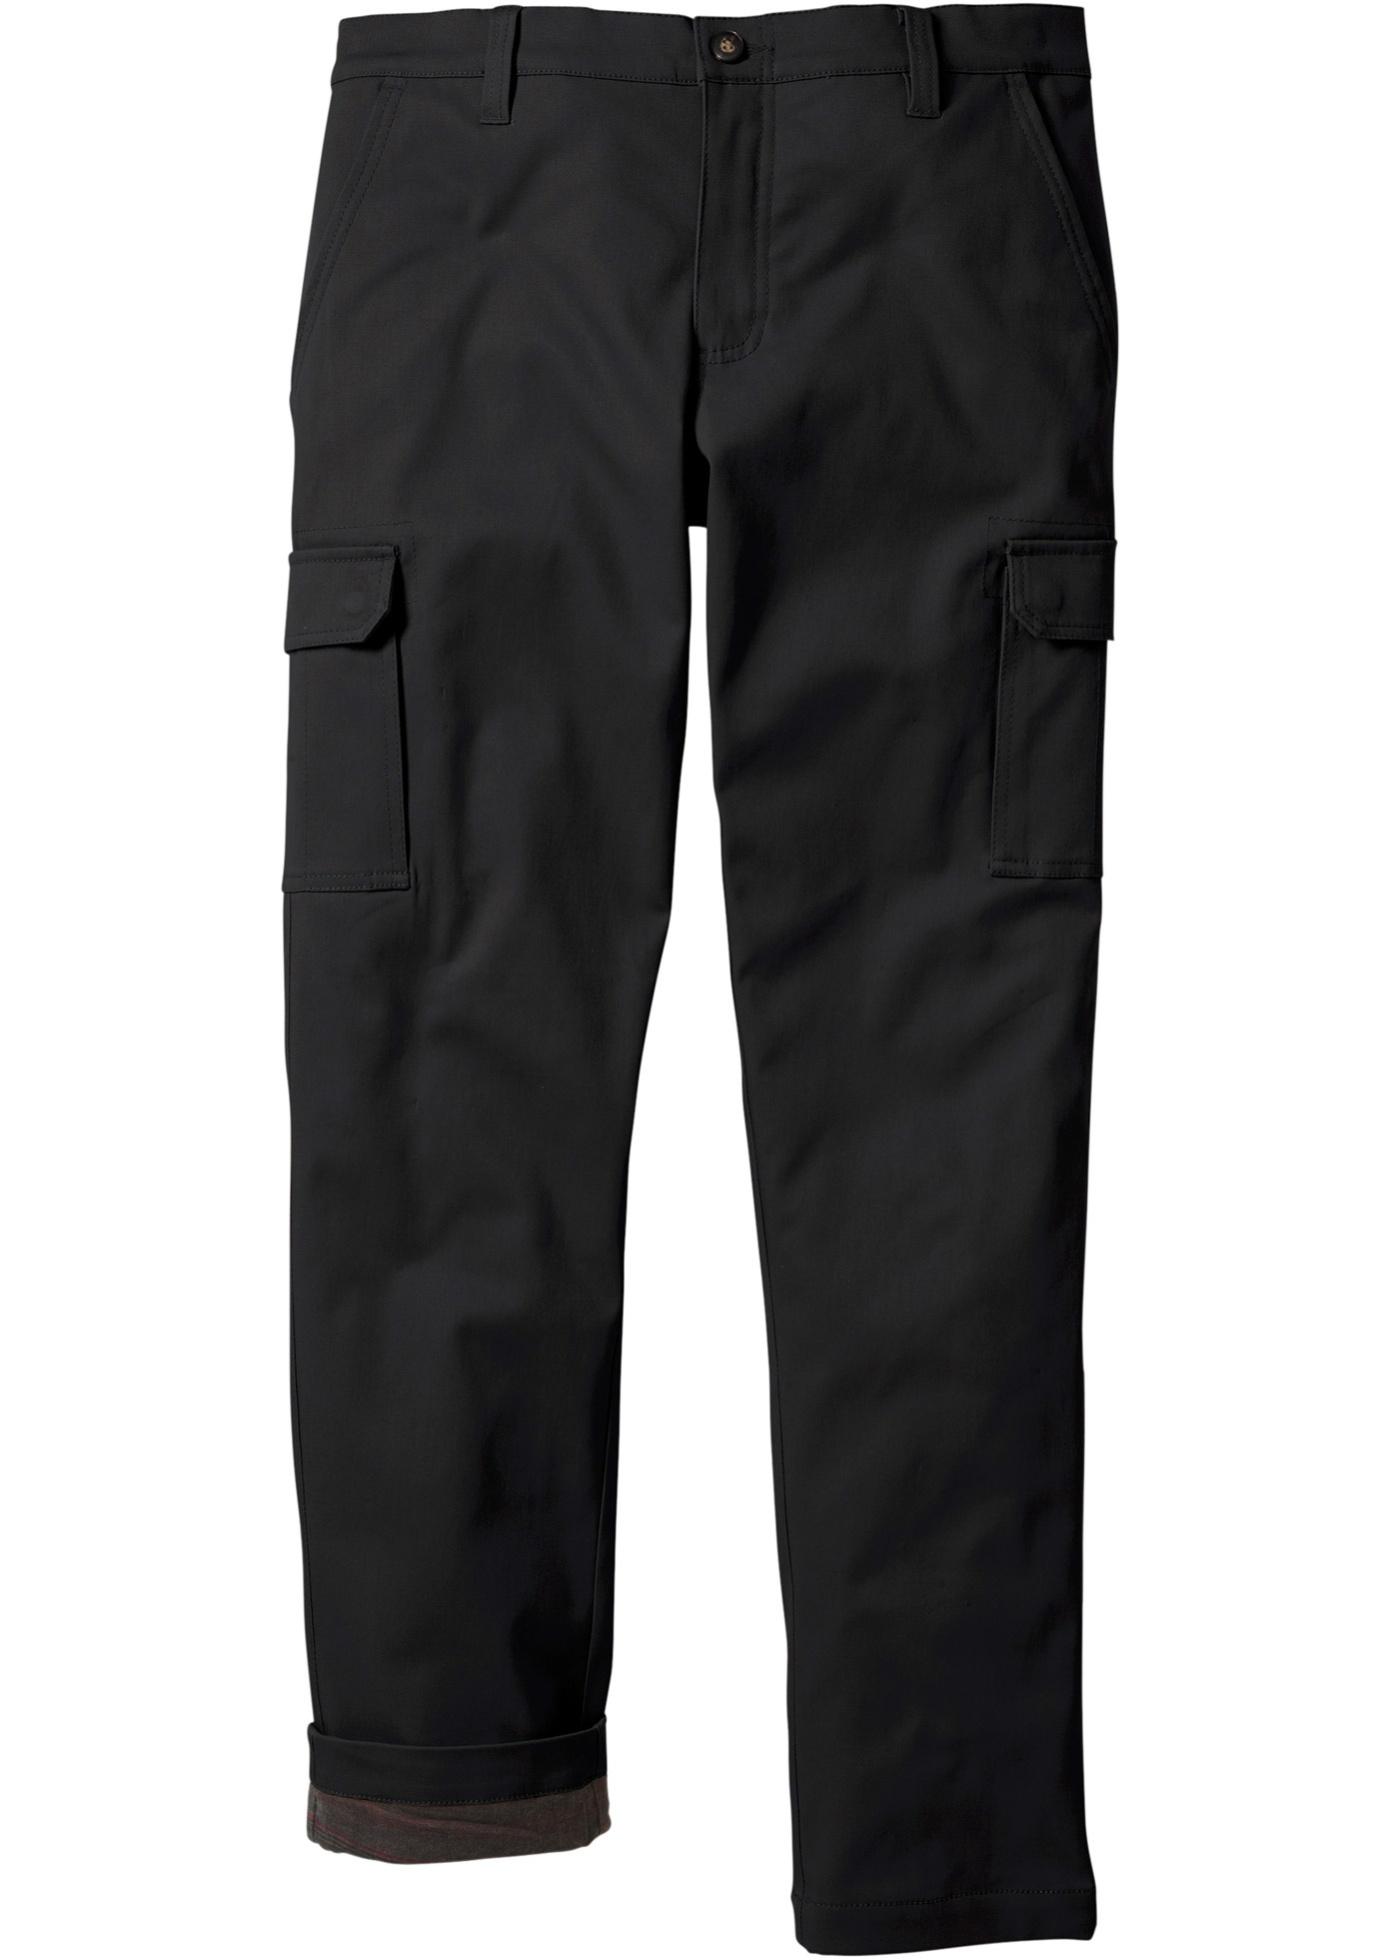 Pantalone termico regular